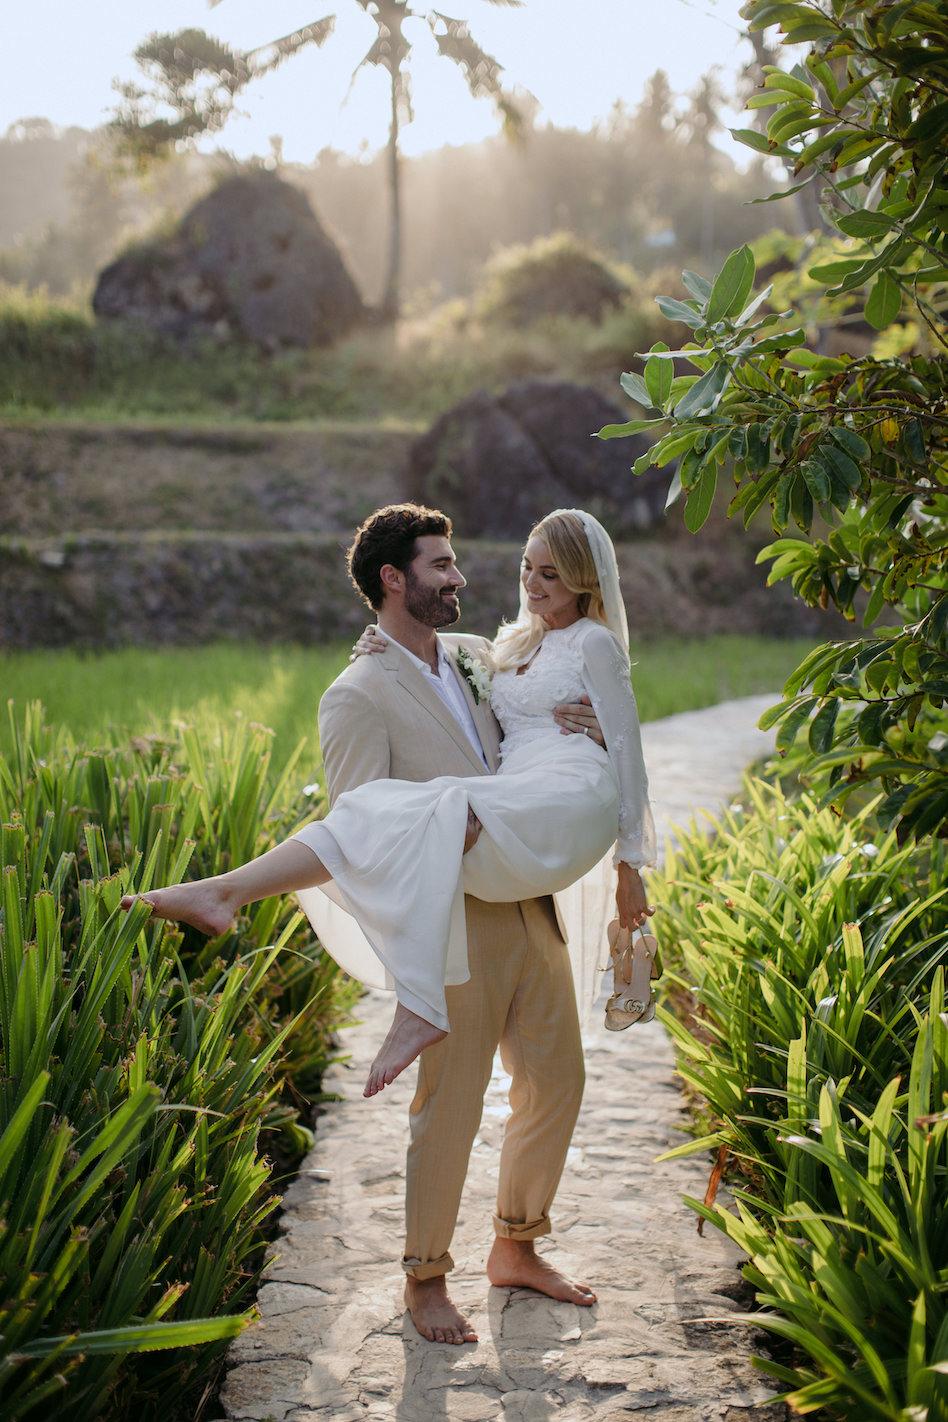 kaitlyn_brody_wedding-708.jpg